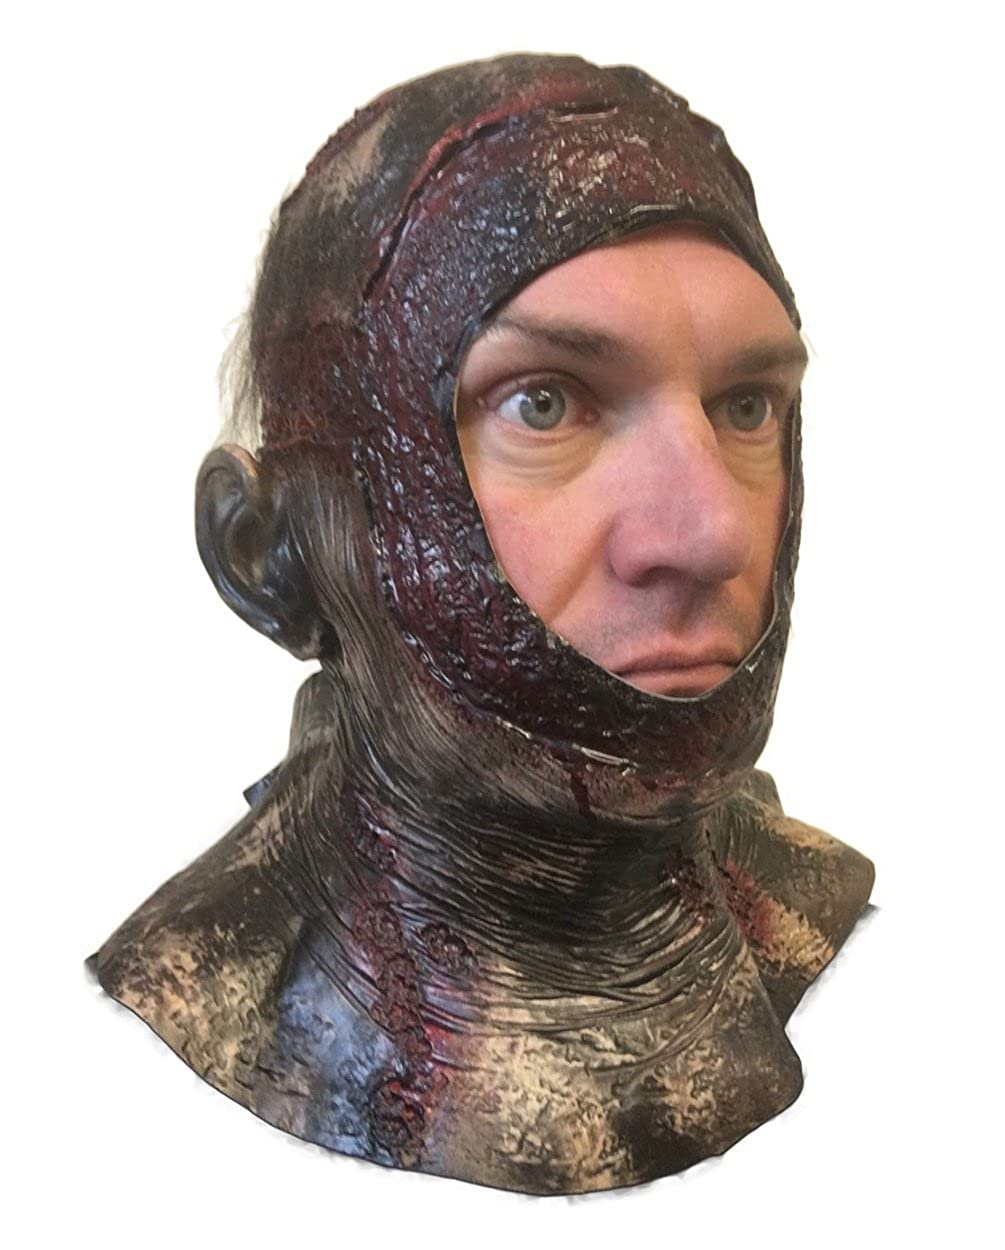 Rubber Johnnies Rotting Bloody Hood Mask, Jason, Halloween, Horror Costume Rubber Johnnies International